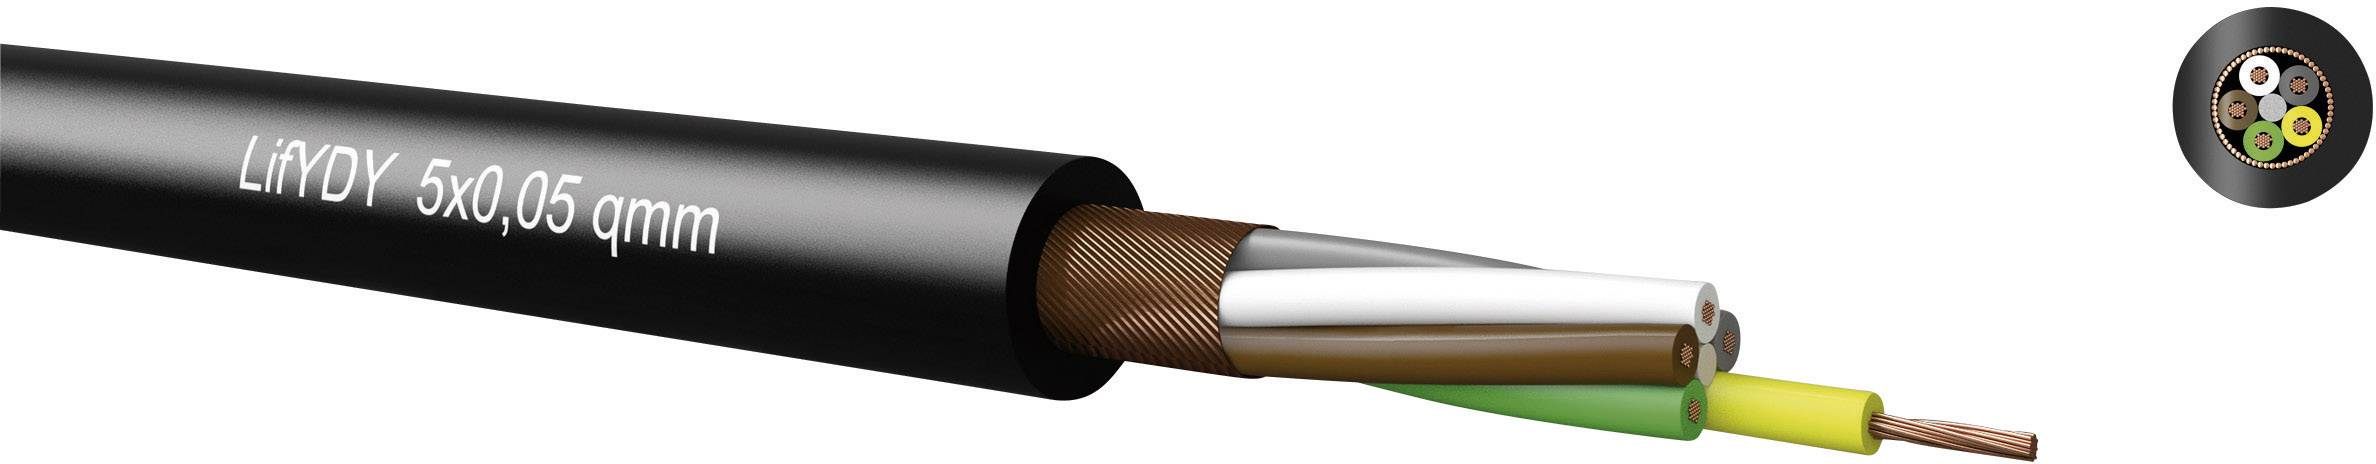 Riadiaci kábel Kabeltronik LifYDY 340301000, 3 x 0.10 mm², vonkajší Ø 3.70 mm, 300 V, metrový tovar, čierna